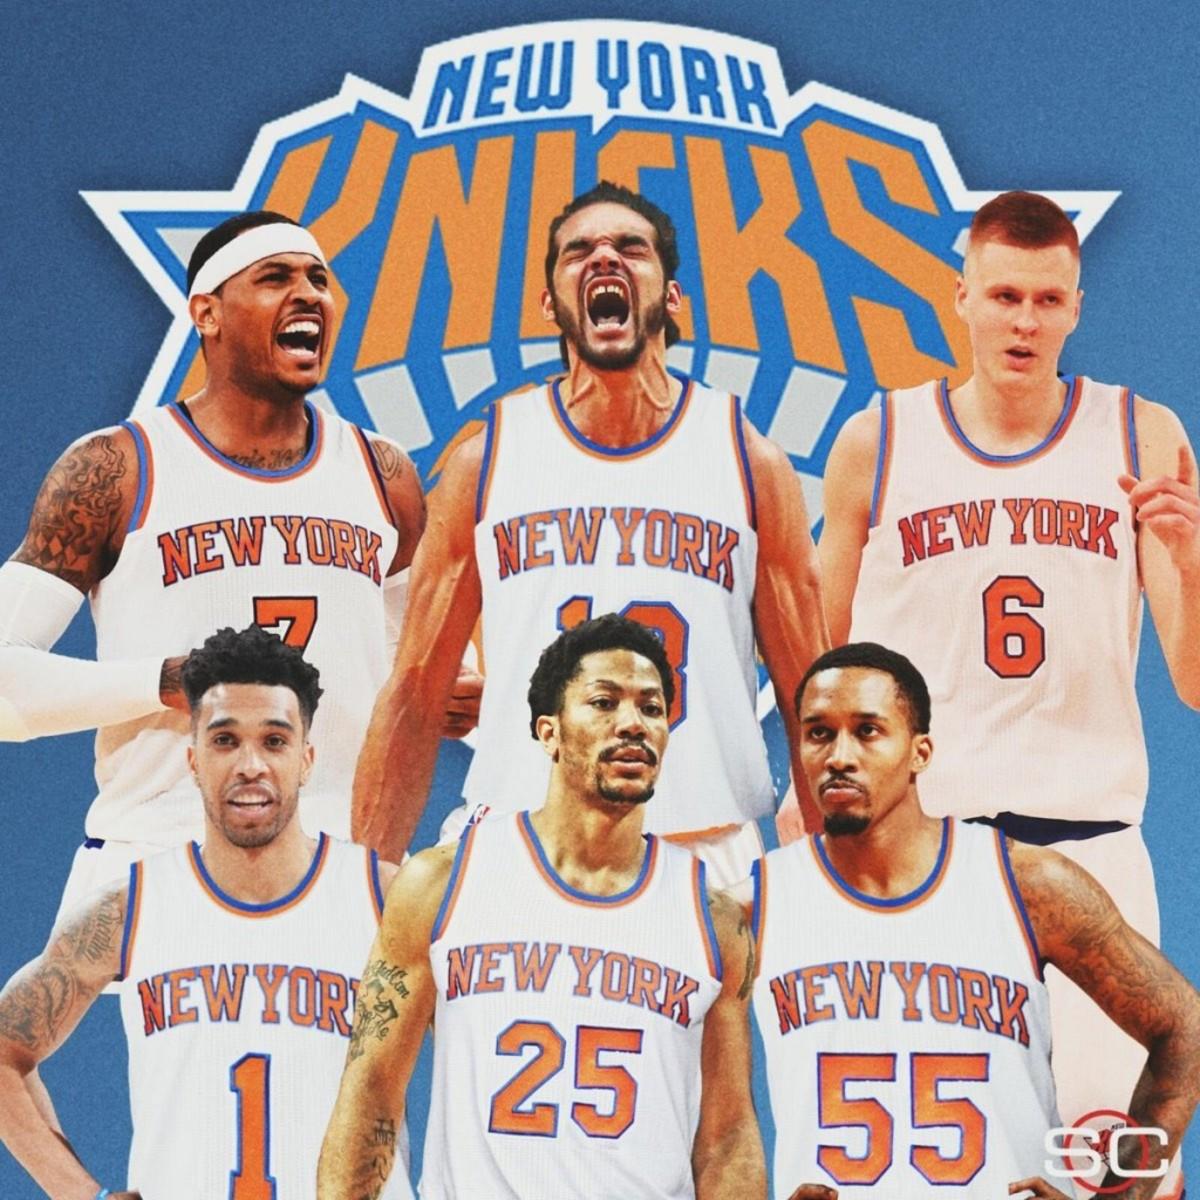 New York Knicks 2017